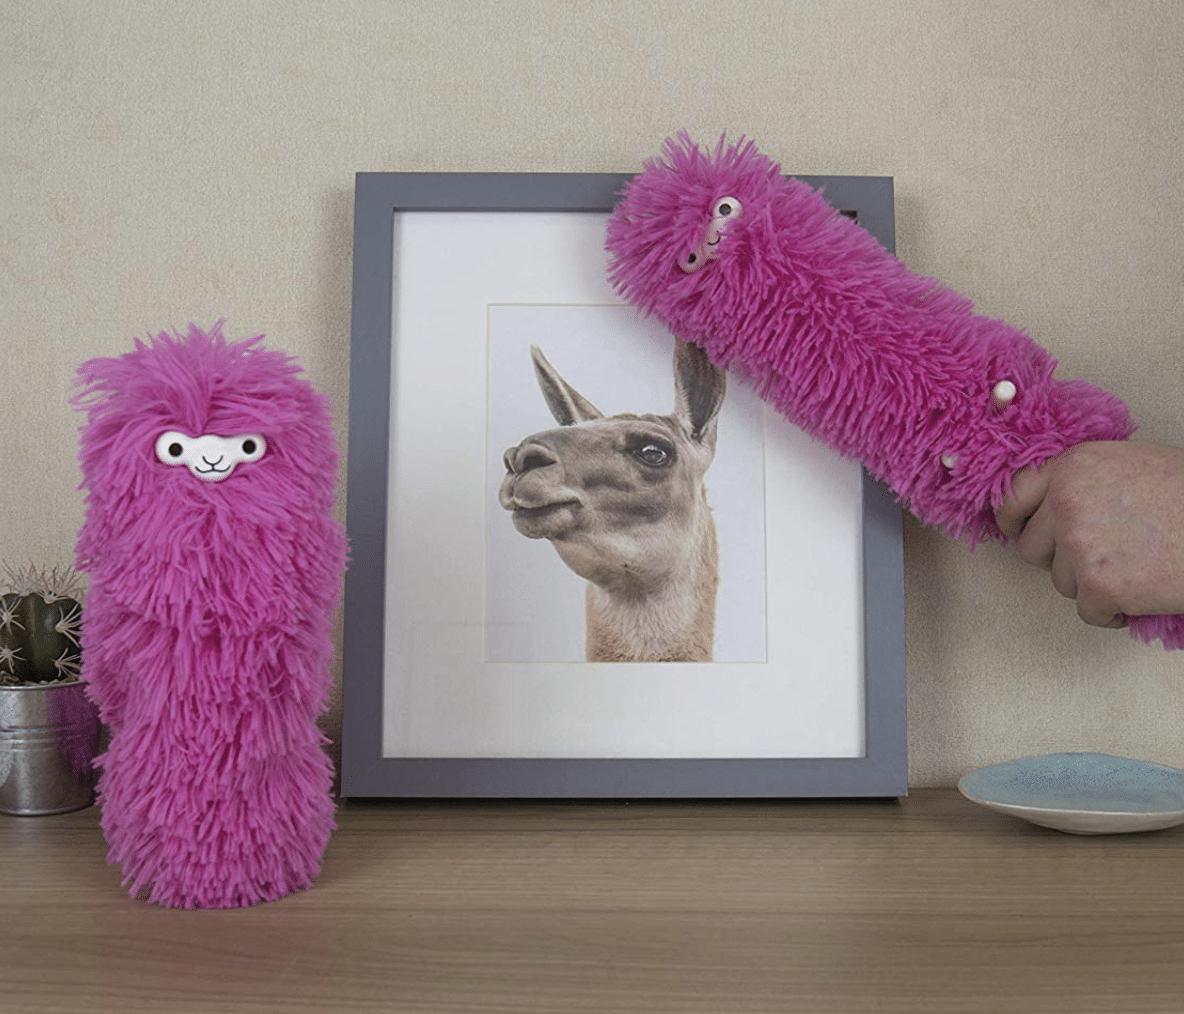 llama-gifts-duster